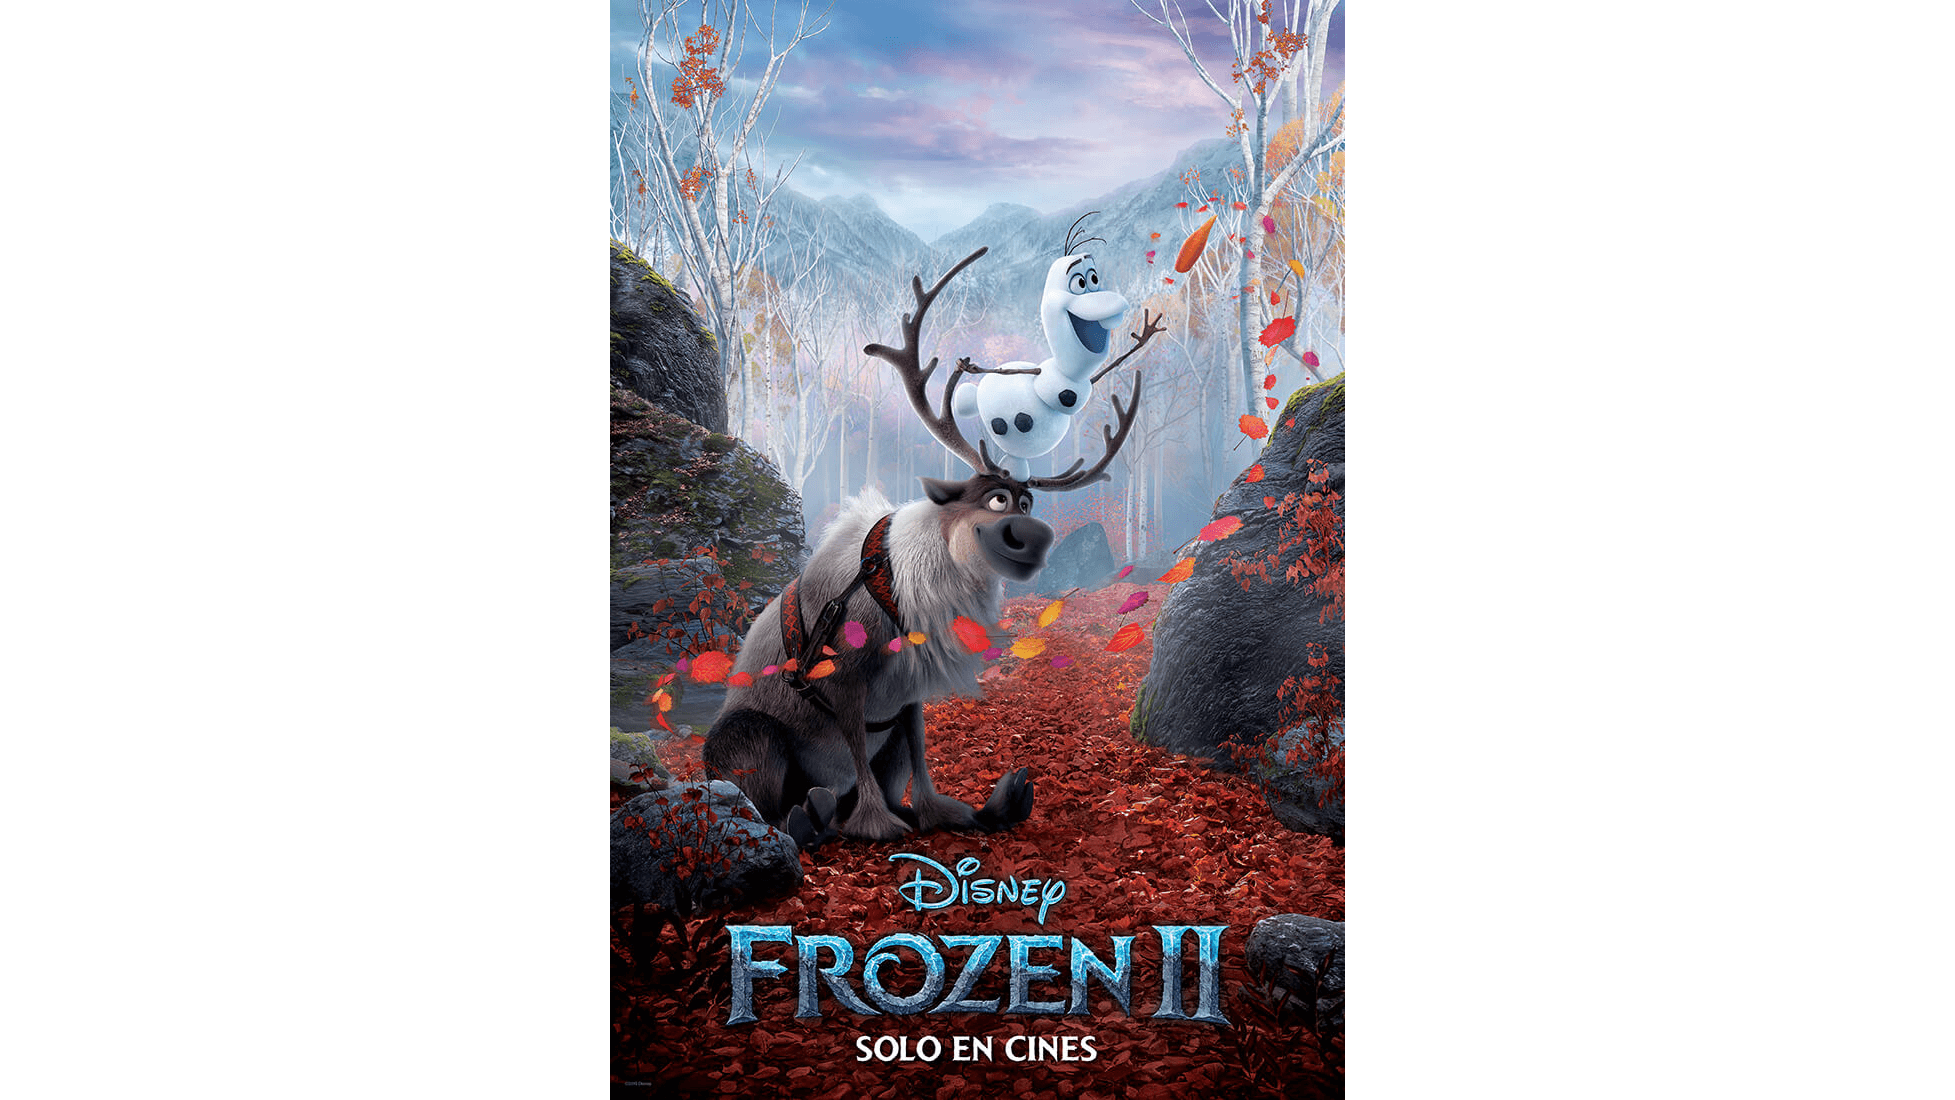 Frozen 2 - Poster Olaf y Sven